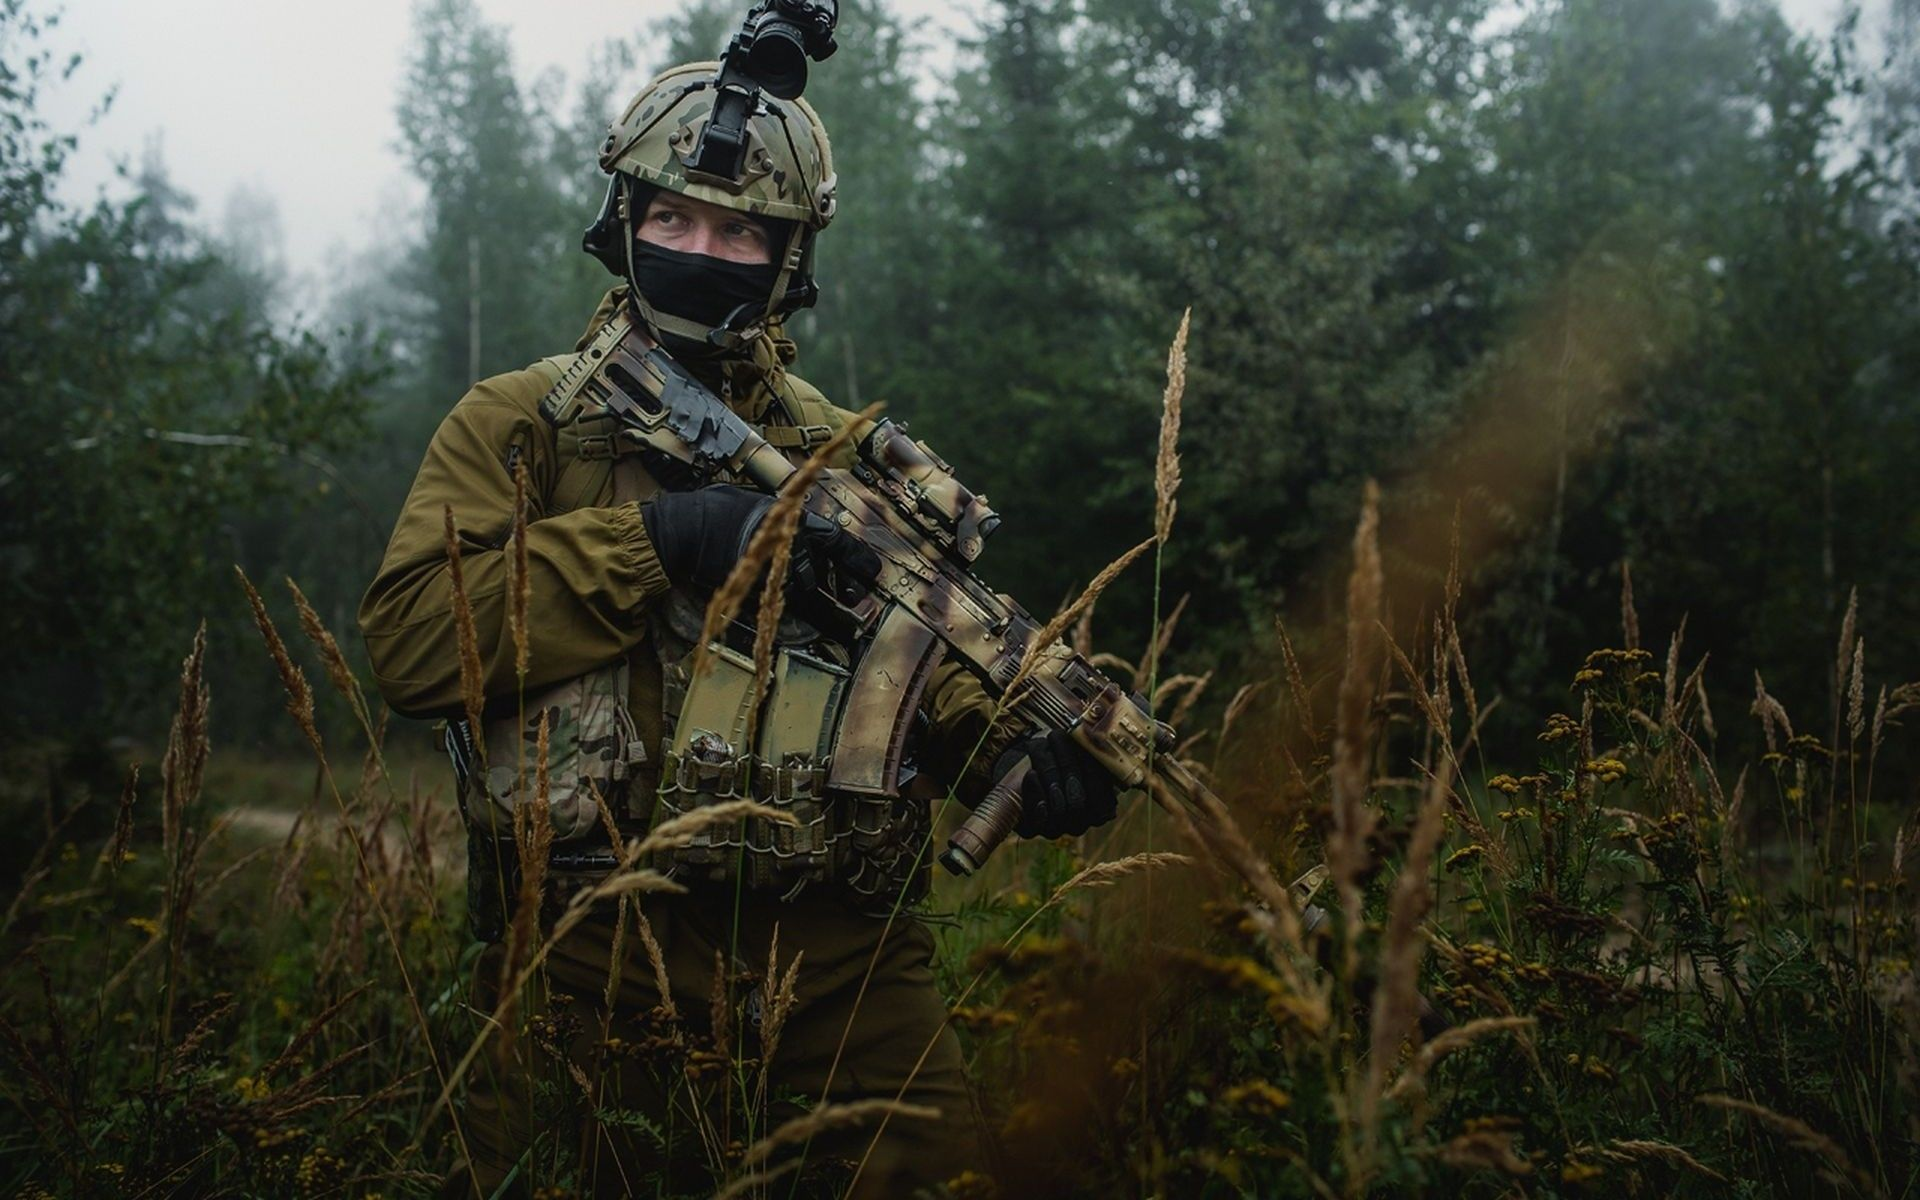 Russian Spetsnaz Wallpapers - Top Free Russian Spetsnaz